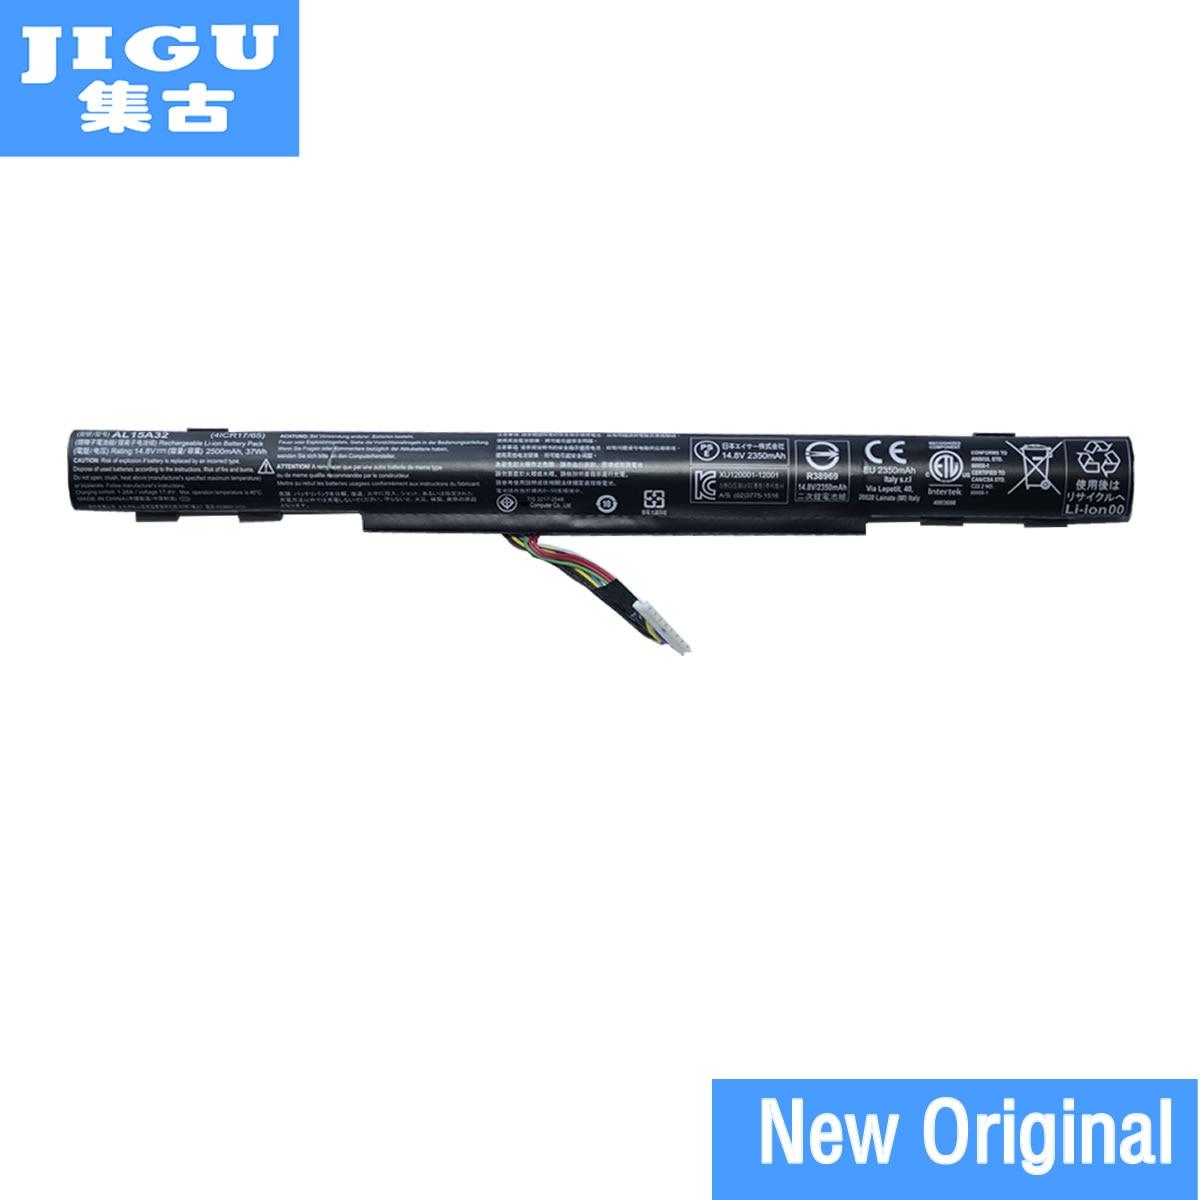 JIGU AL15A32 الأصلي بطارية كمبيوتر محمول لشركة أيسر أسباير أسباير E5-422 E5-472G E5-473 E5-473G E5-522 E5-532 E5-573G E5-553G V3-574G